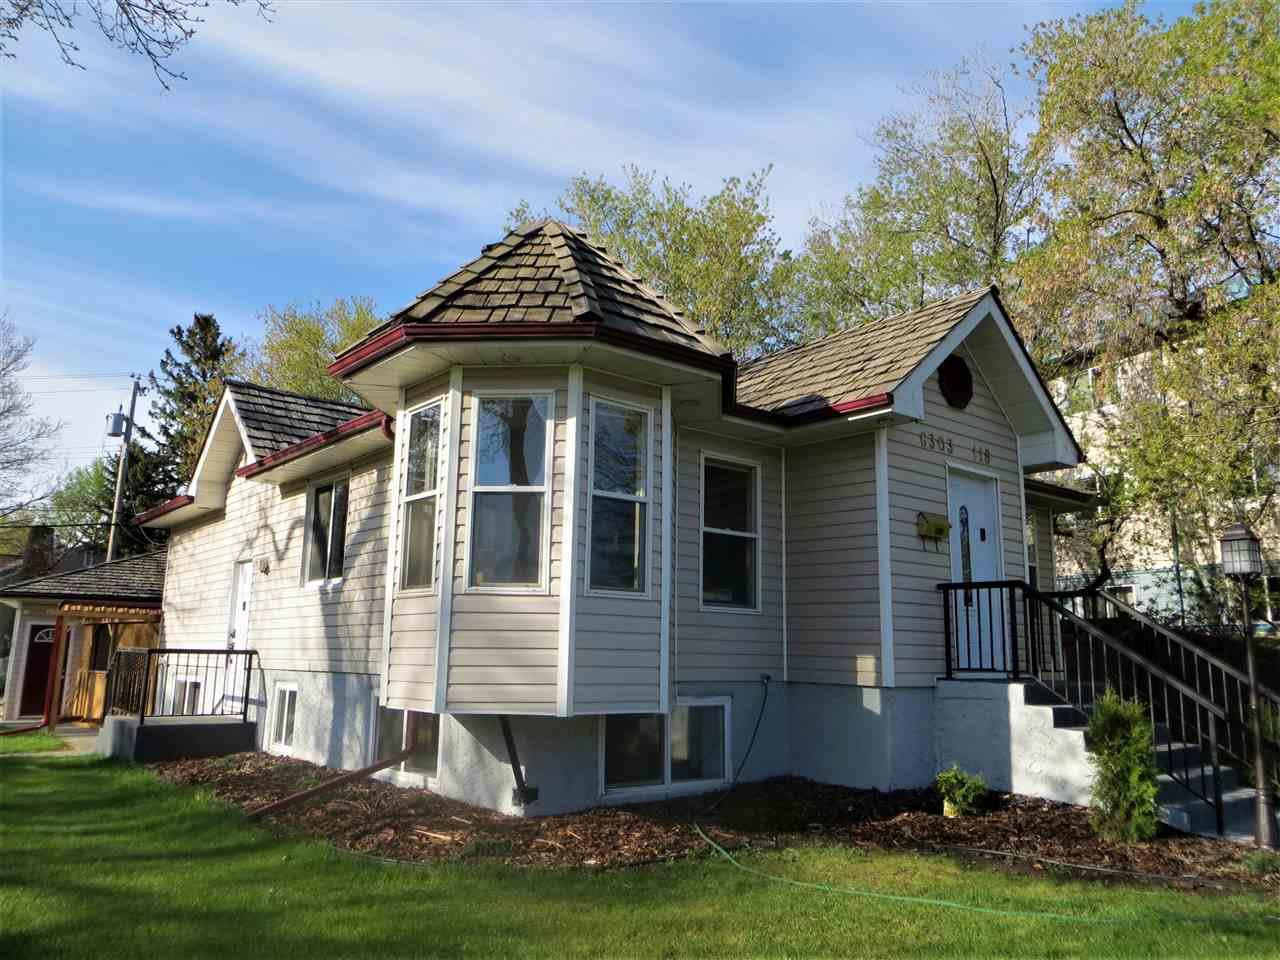 Main Photo: 6303 118 Avenue in Edmonton: Zone 09 House for sale : MLS®# E4156216